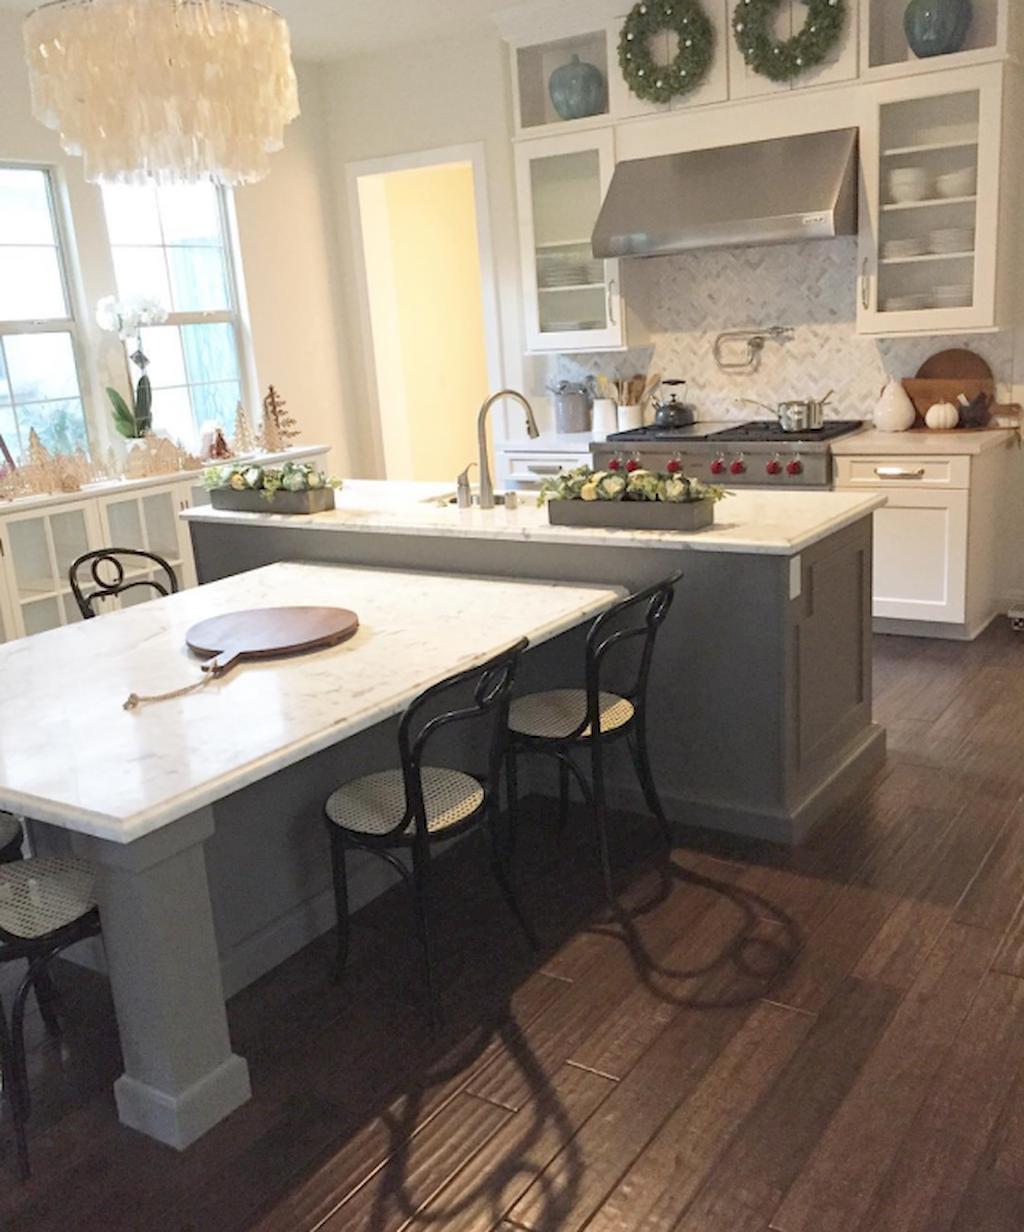 Stunning Small Island Kitchen Table Ideas Home To Z Kitchen Island Dining Table Kitchen Design Small Diy Kitchen Renovation